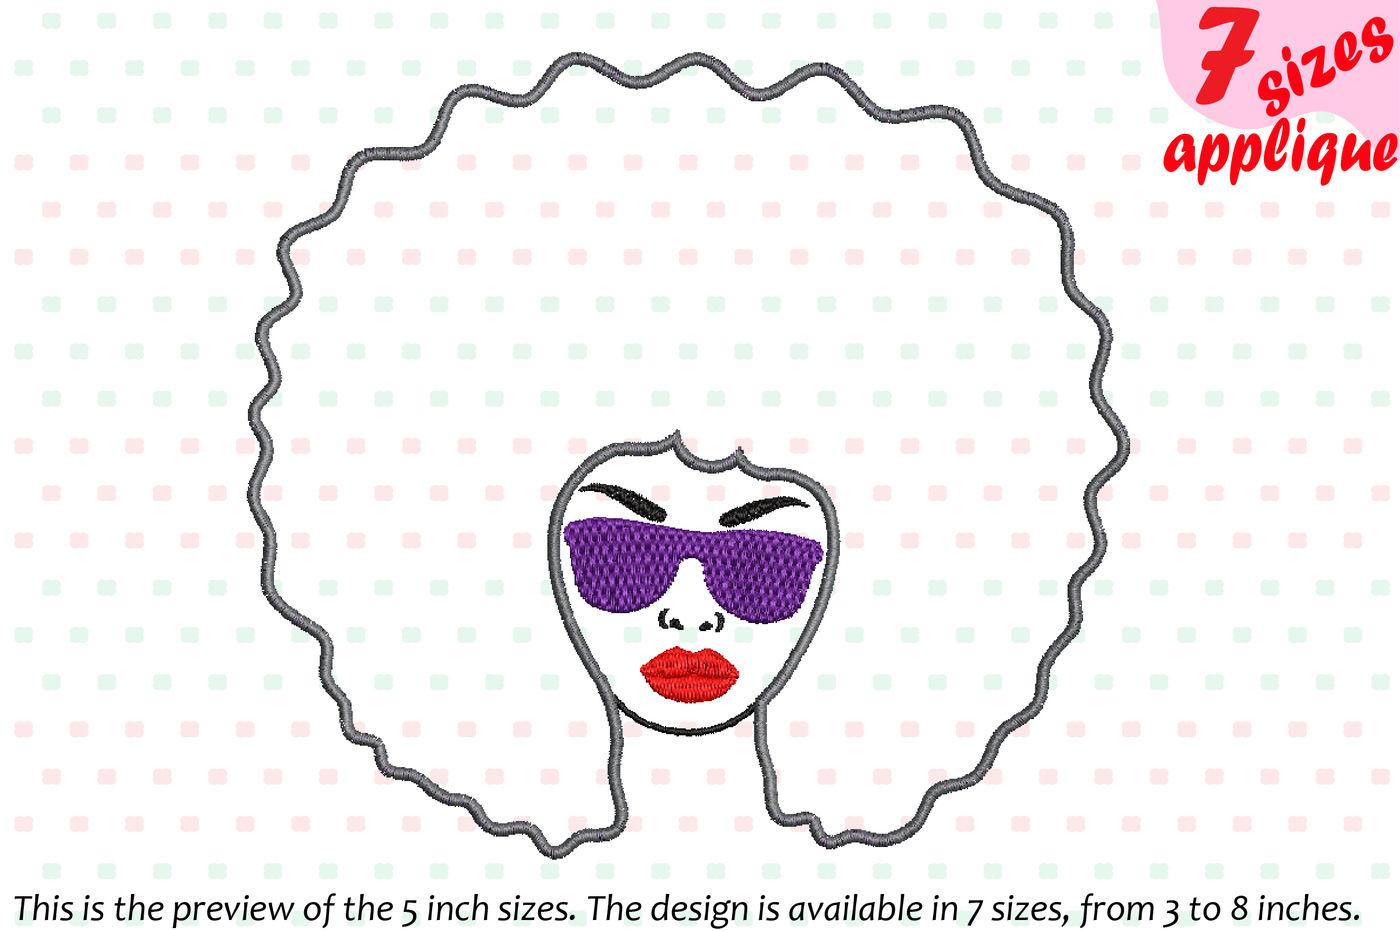 Applique Black Woman Nubian Princess Queen Designs For Embroidery